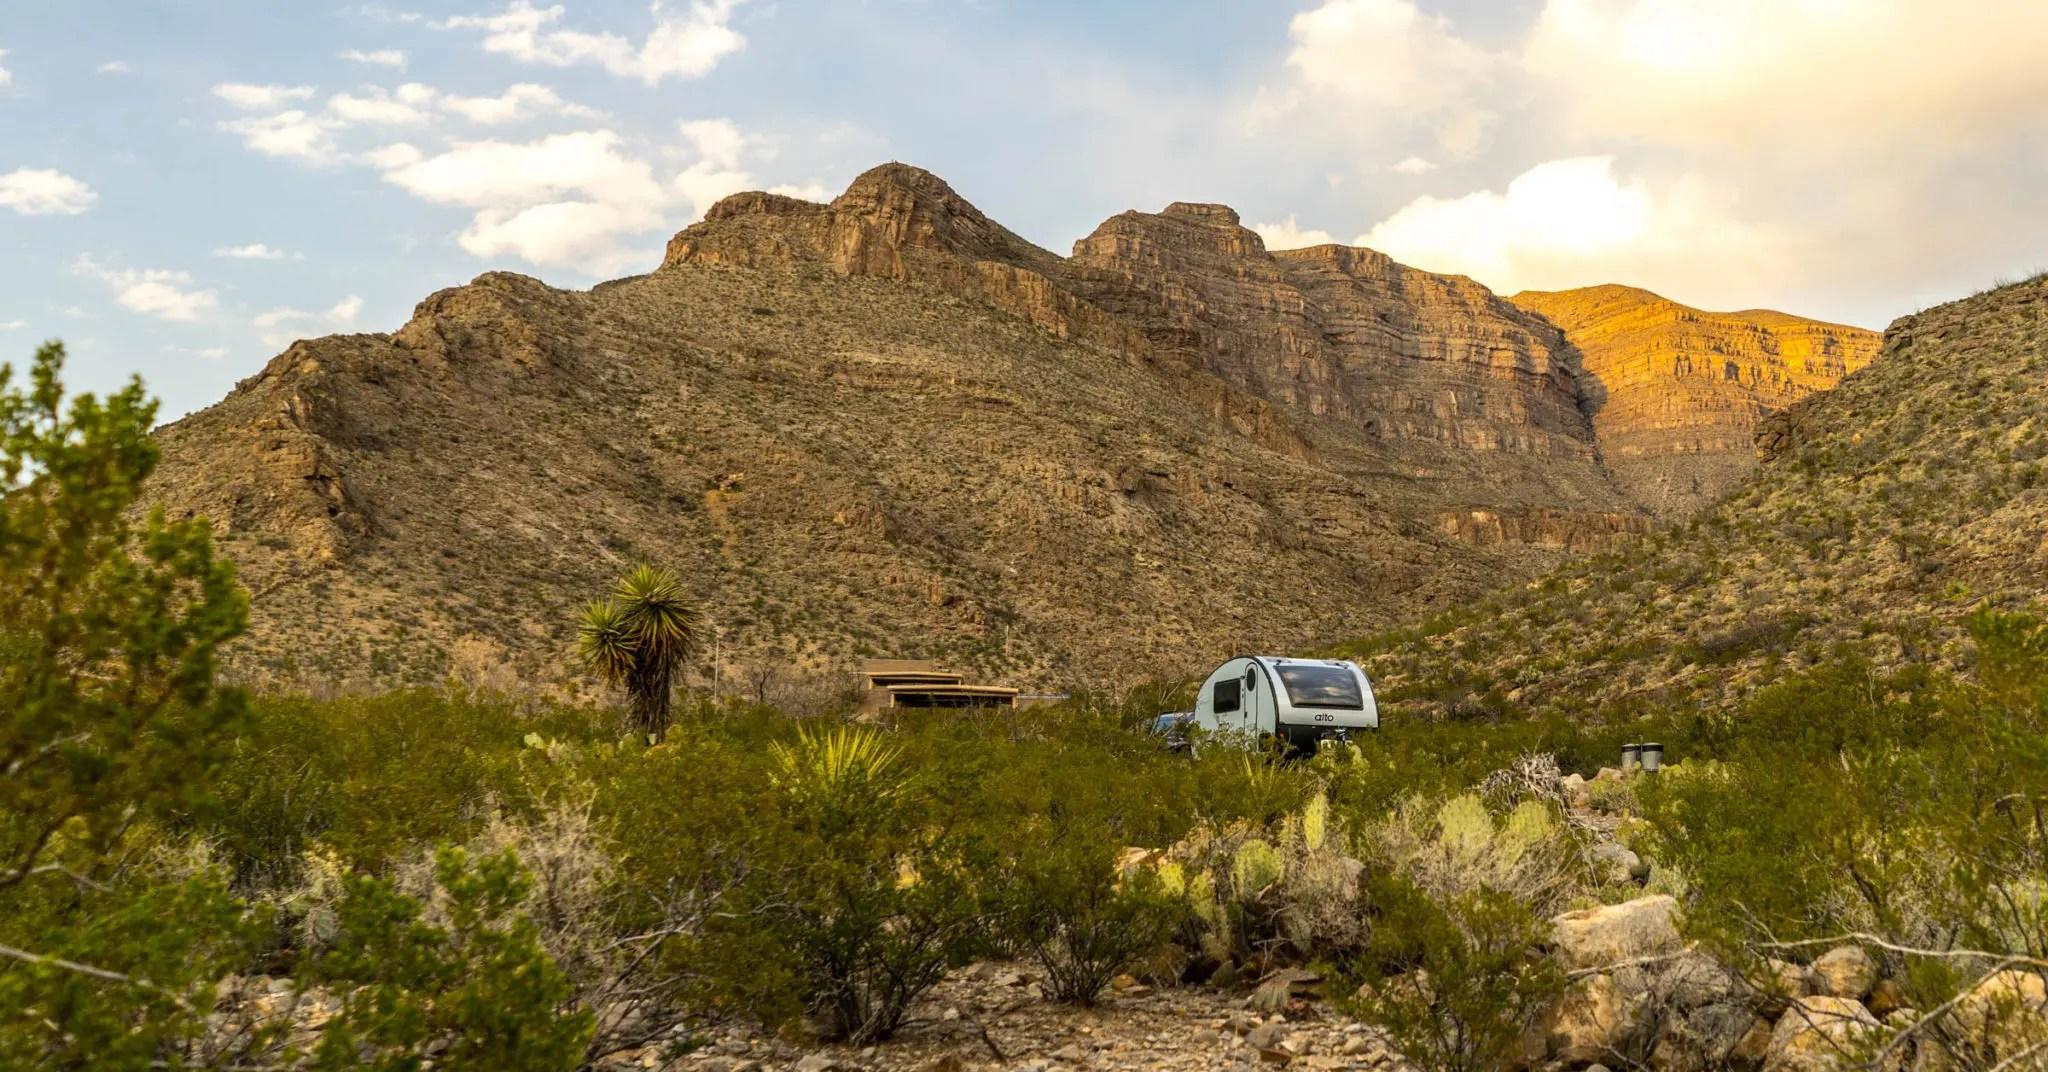 vagabond adventures as a fulltimer in a travel trailer